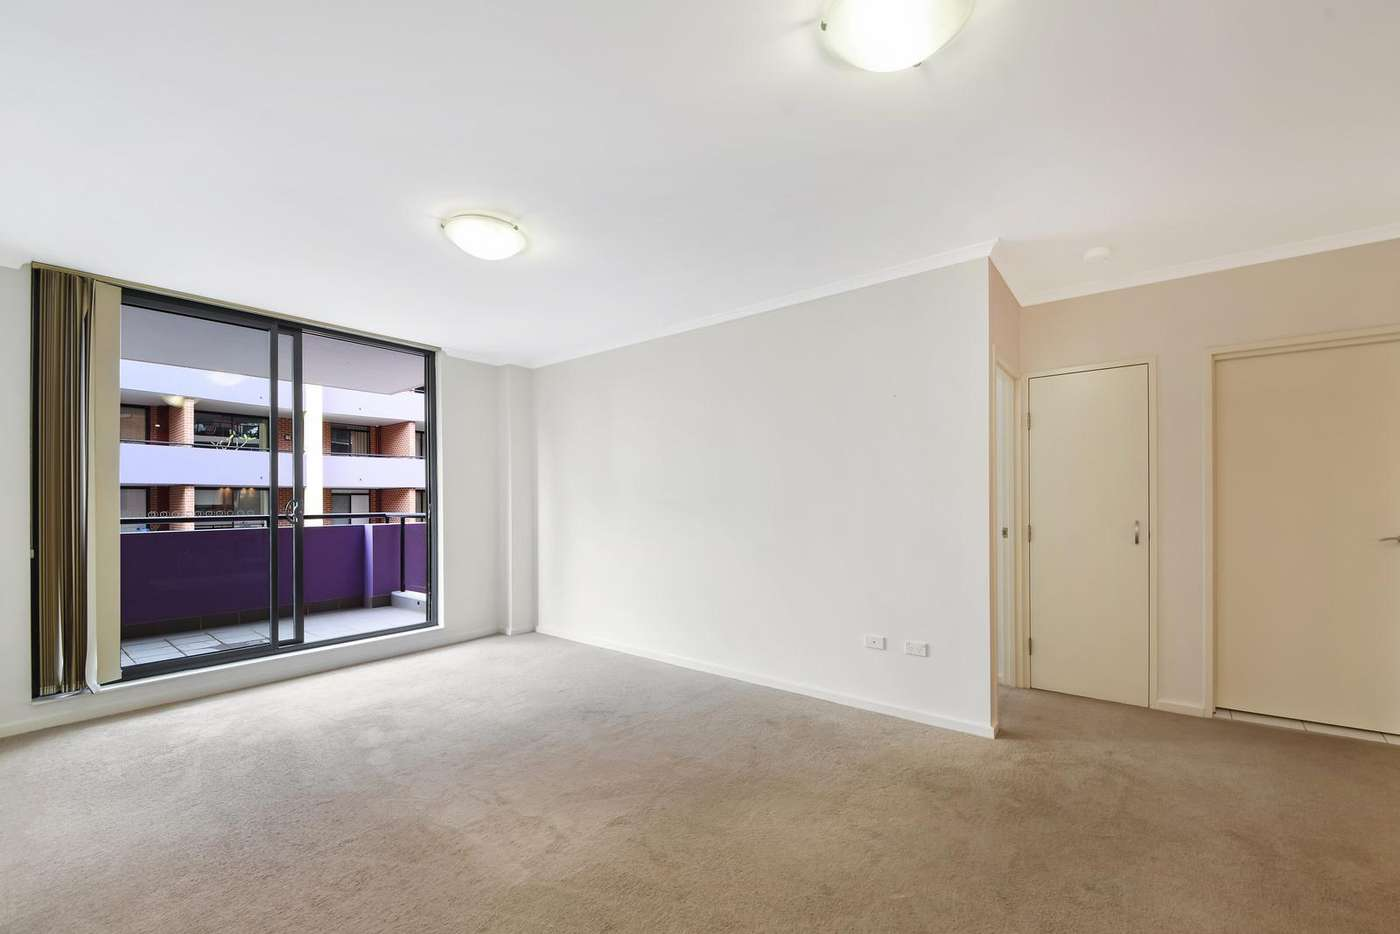 Main view of Homely apartment listing, 2407/32 Orara Street, Waitara NSW 2077